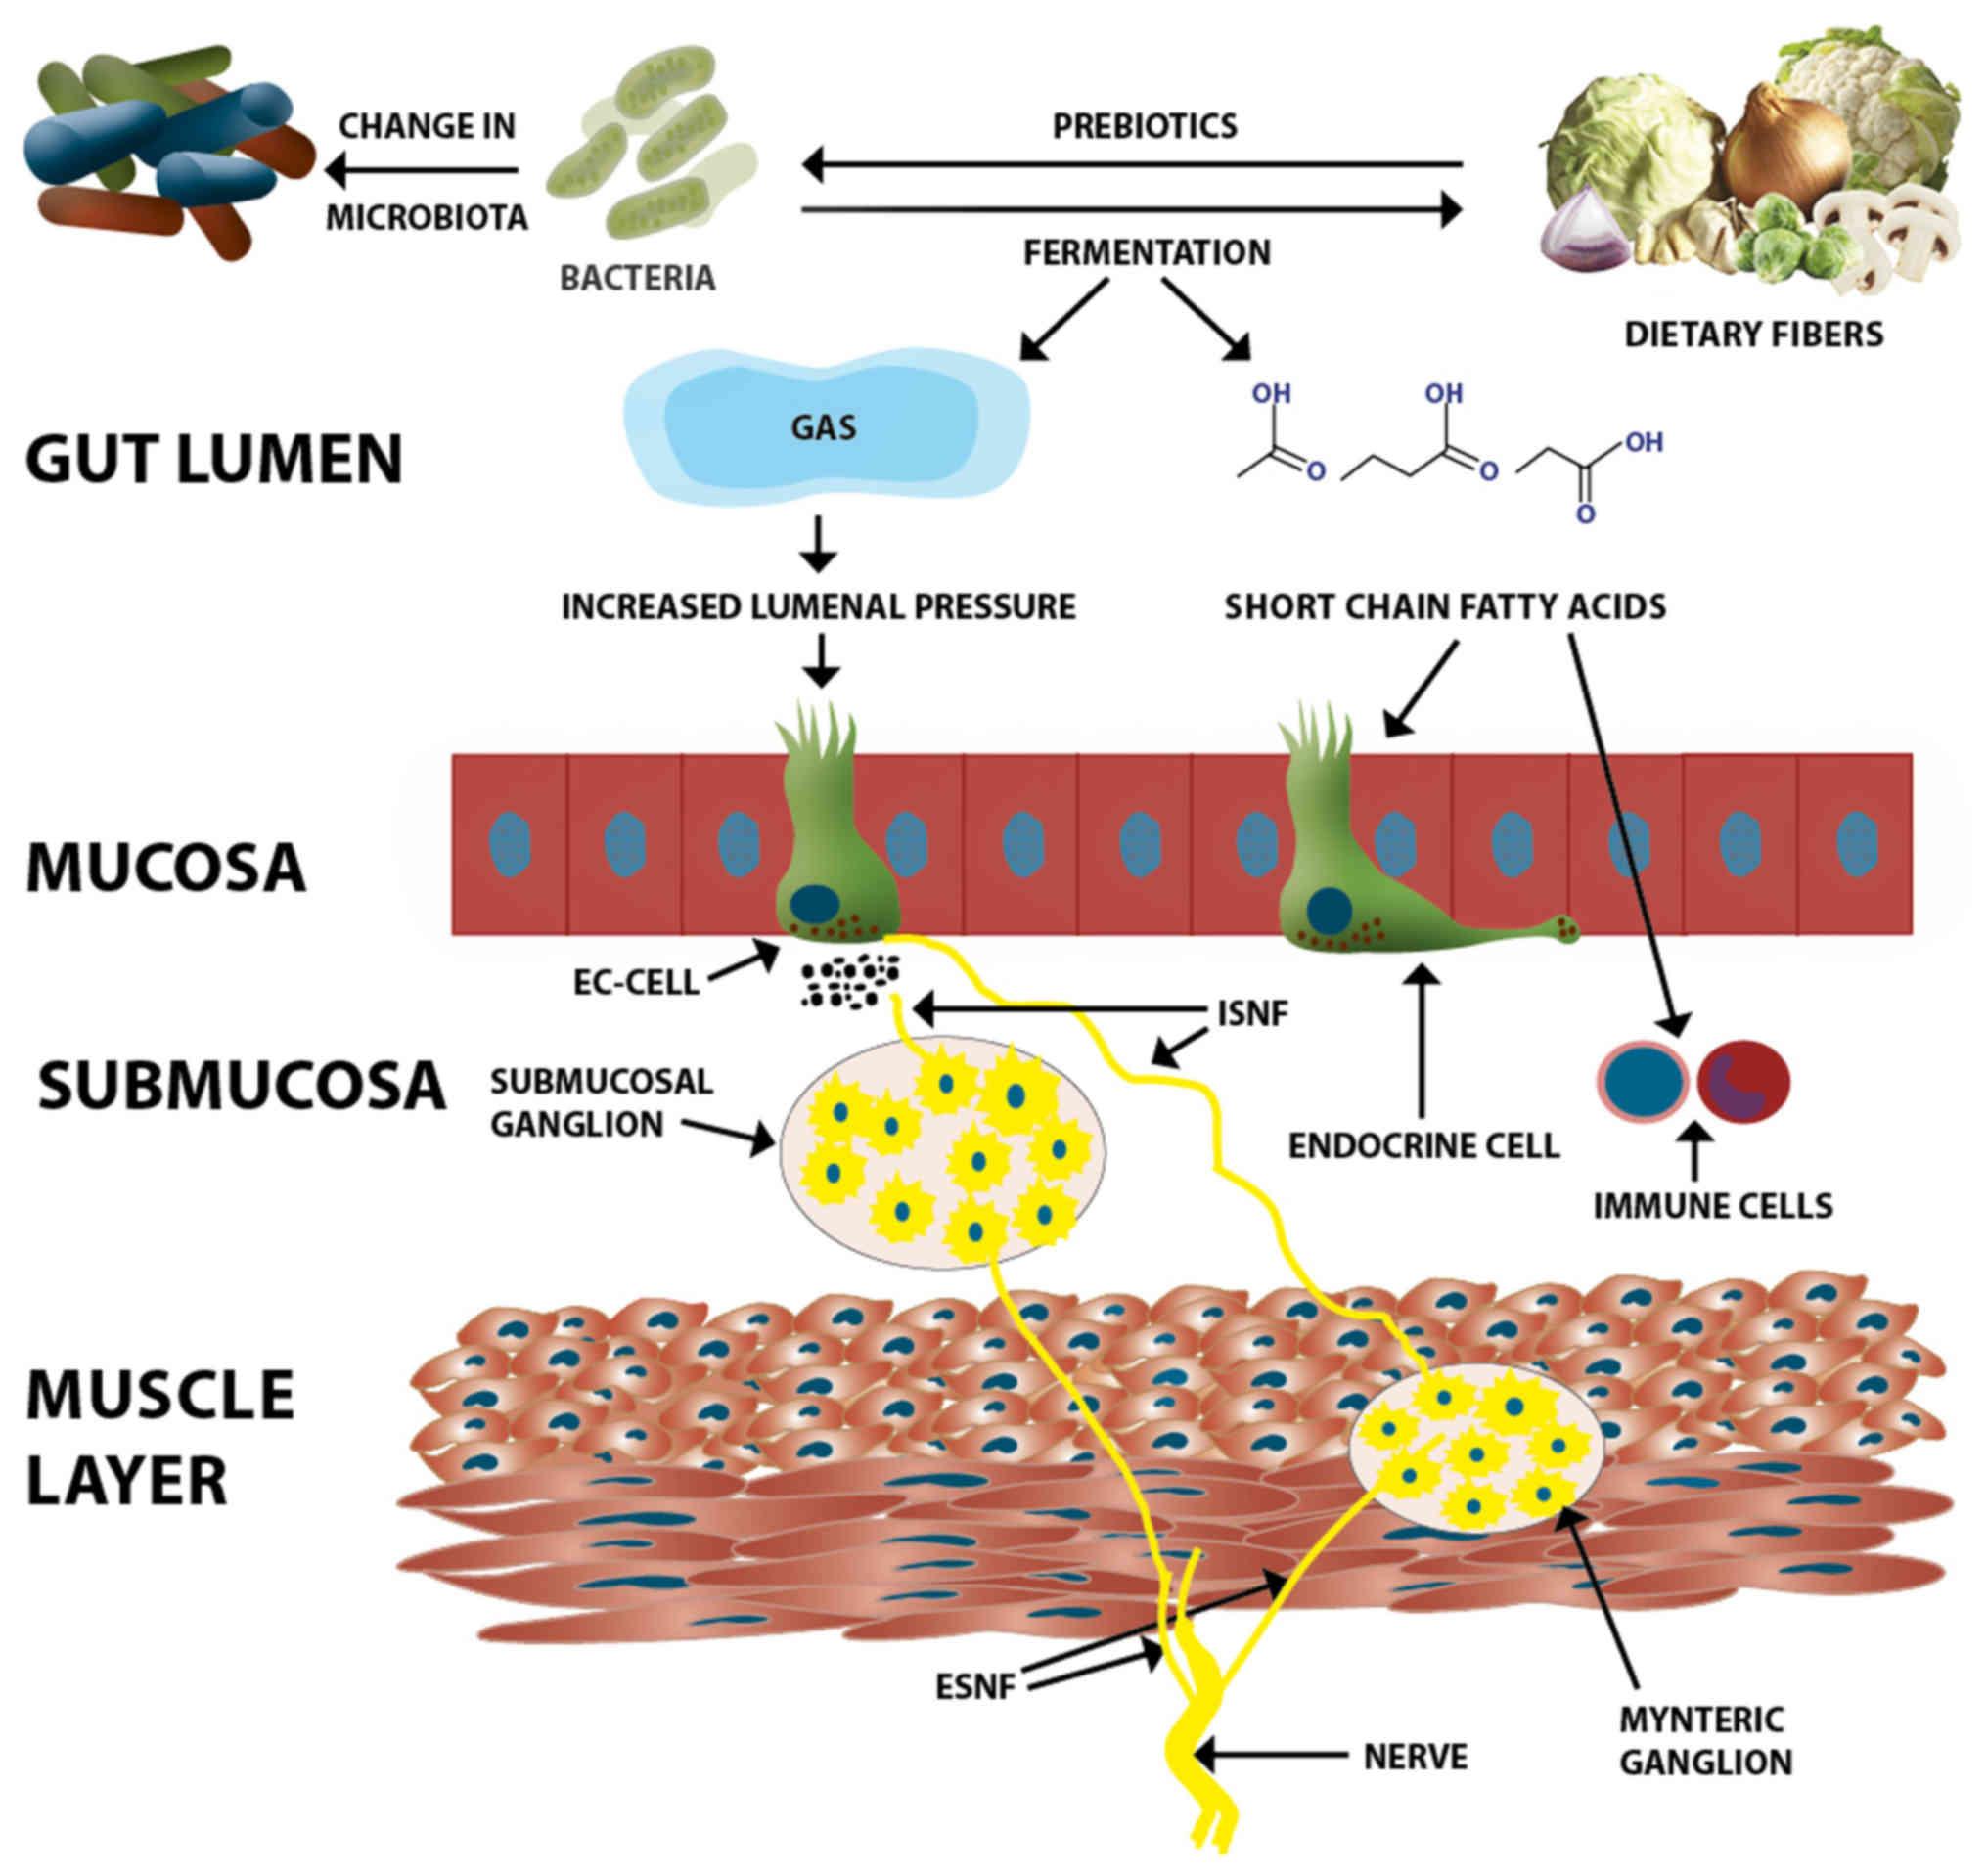 Волокна влияют на работу желудка и кишечника